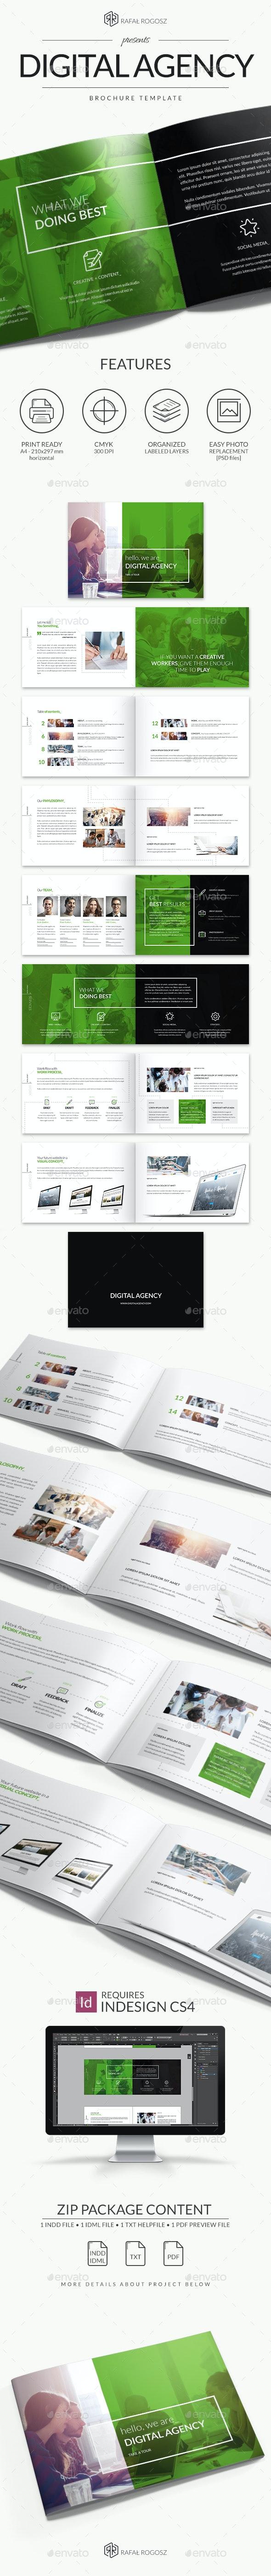 Digital Agency Bochure - Brochures Print Templates